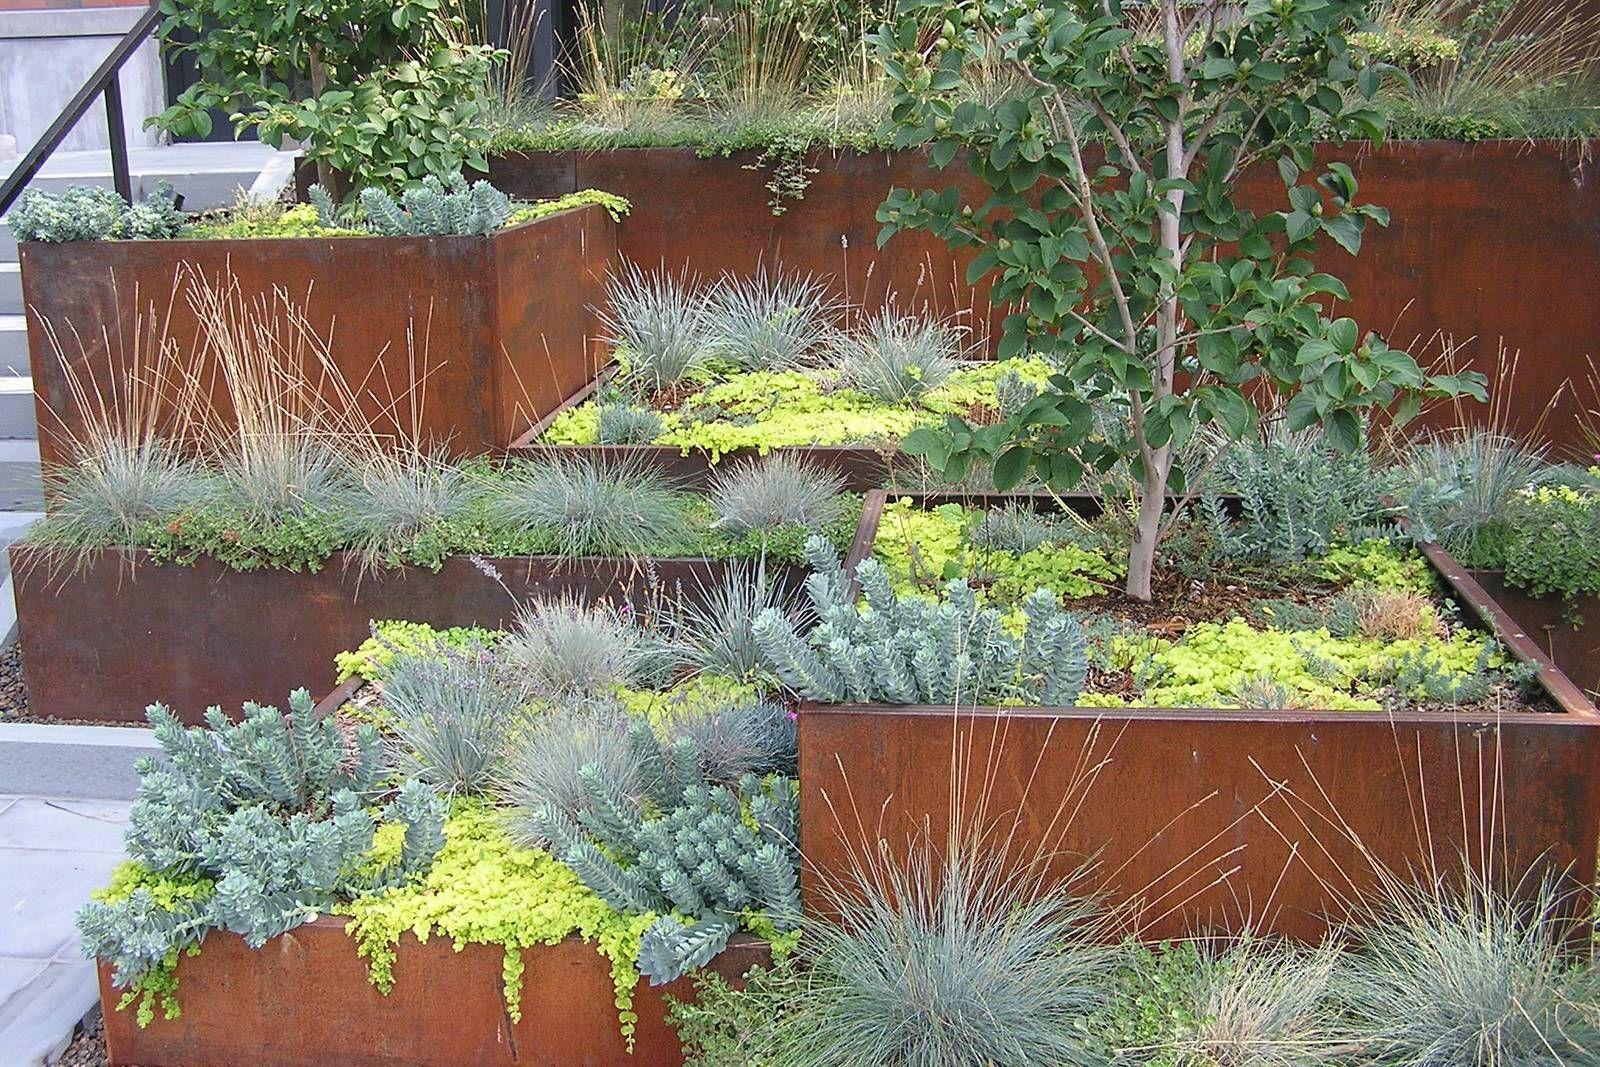 Future Green Studio Carroll Street Mta Plaza Brooklyn In 2020 Landscape Design Garden Design Modern Landscaping